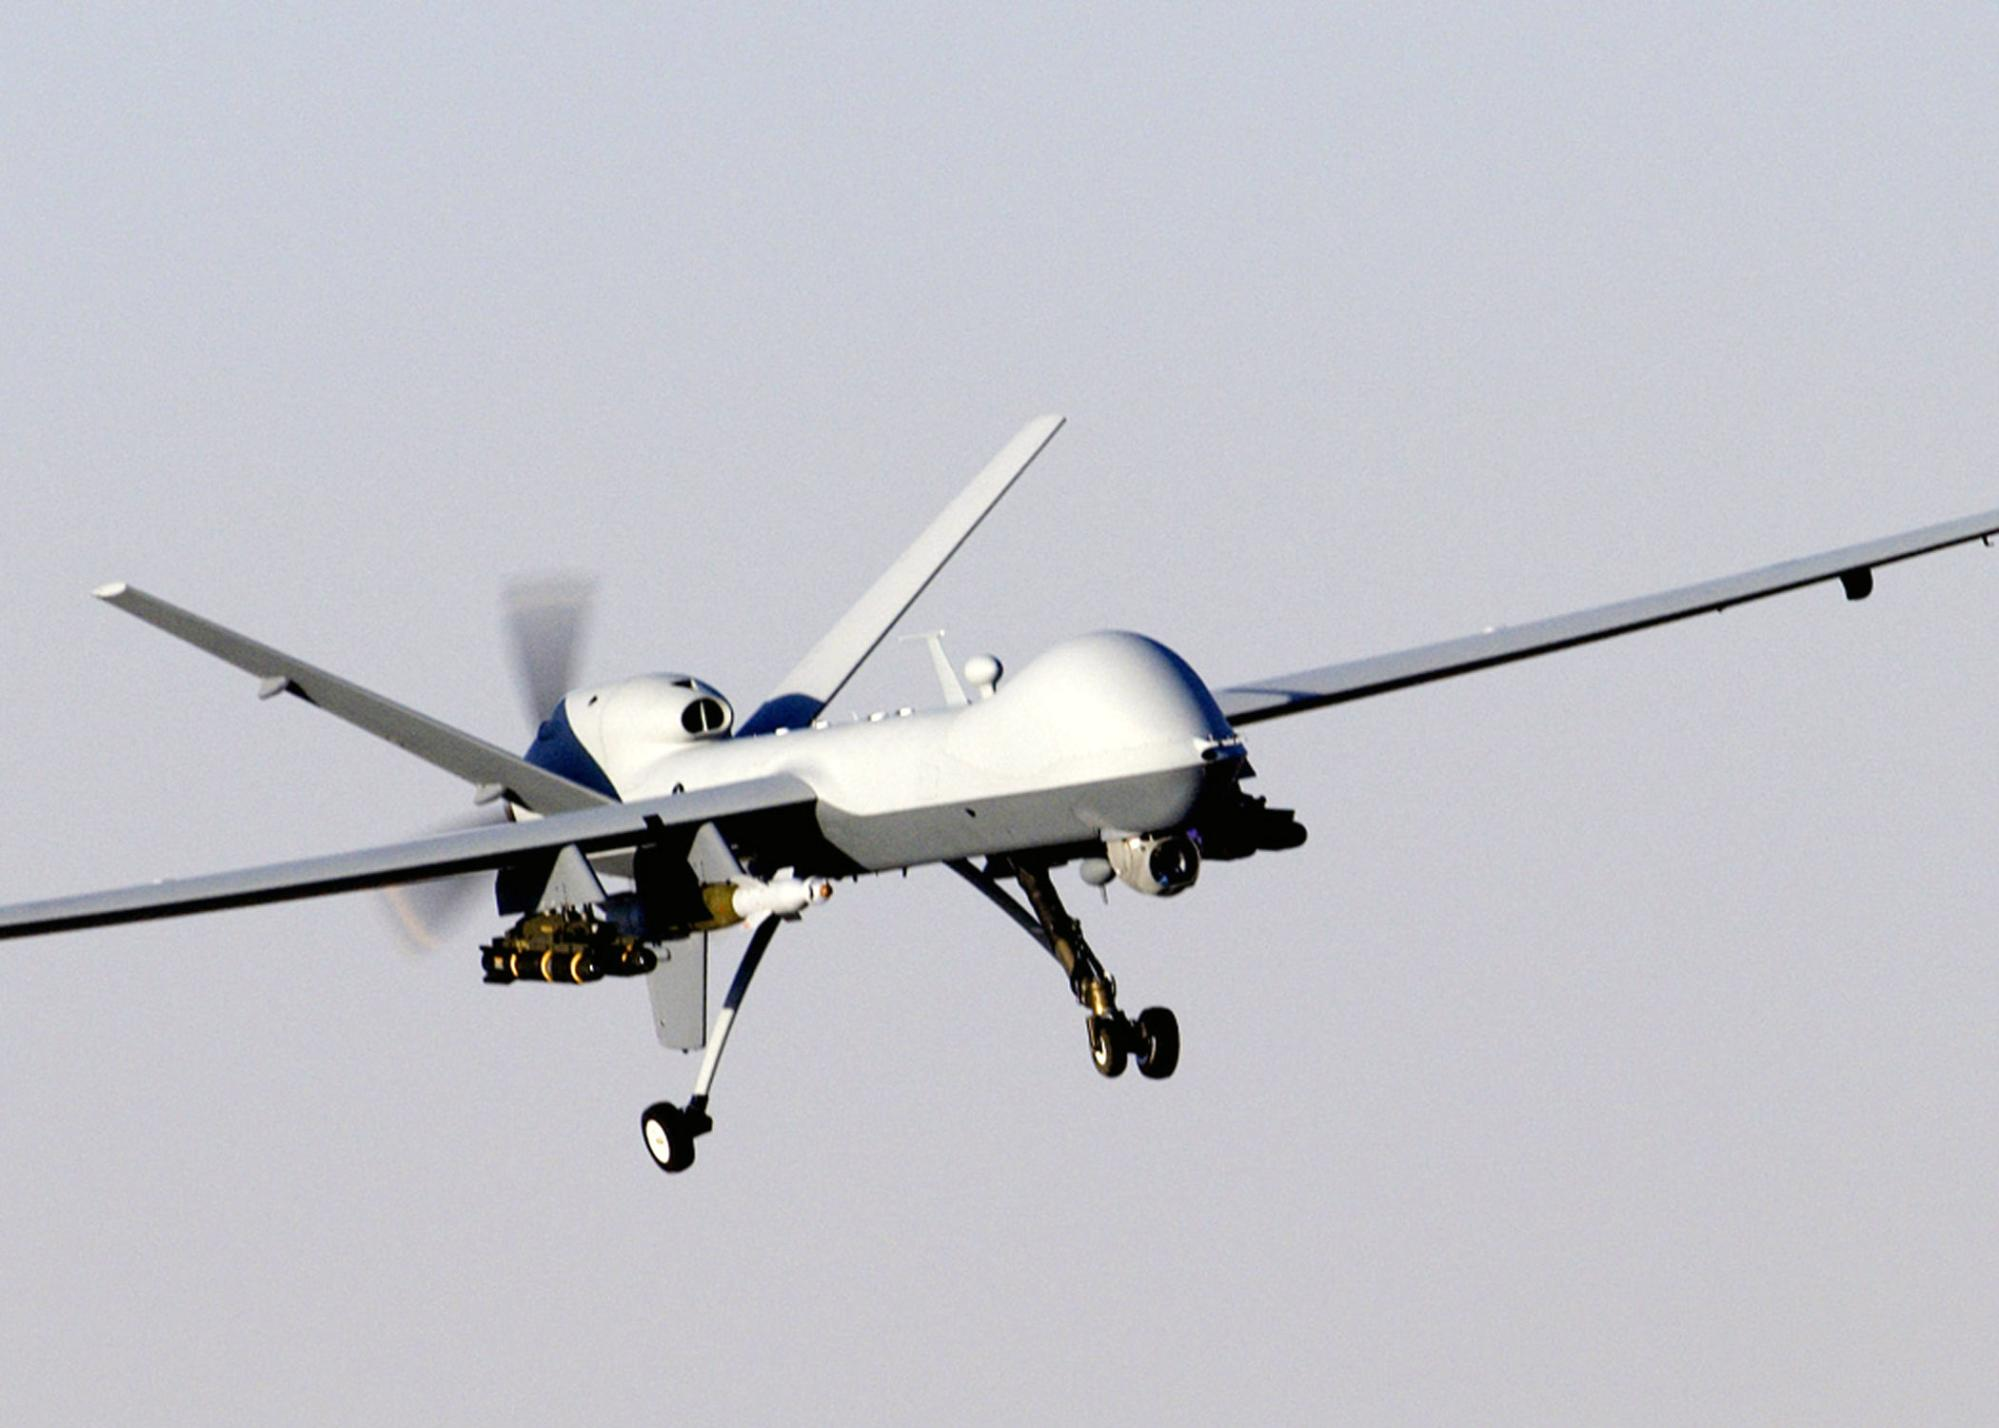 General Atomics drone